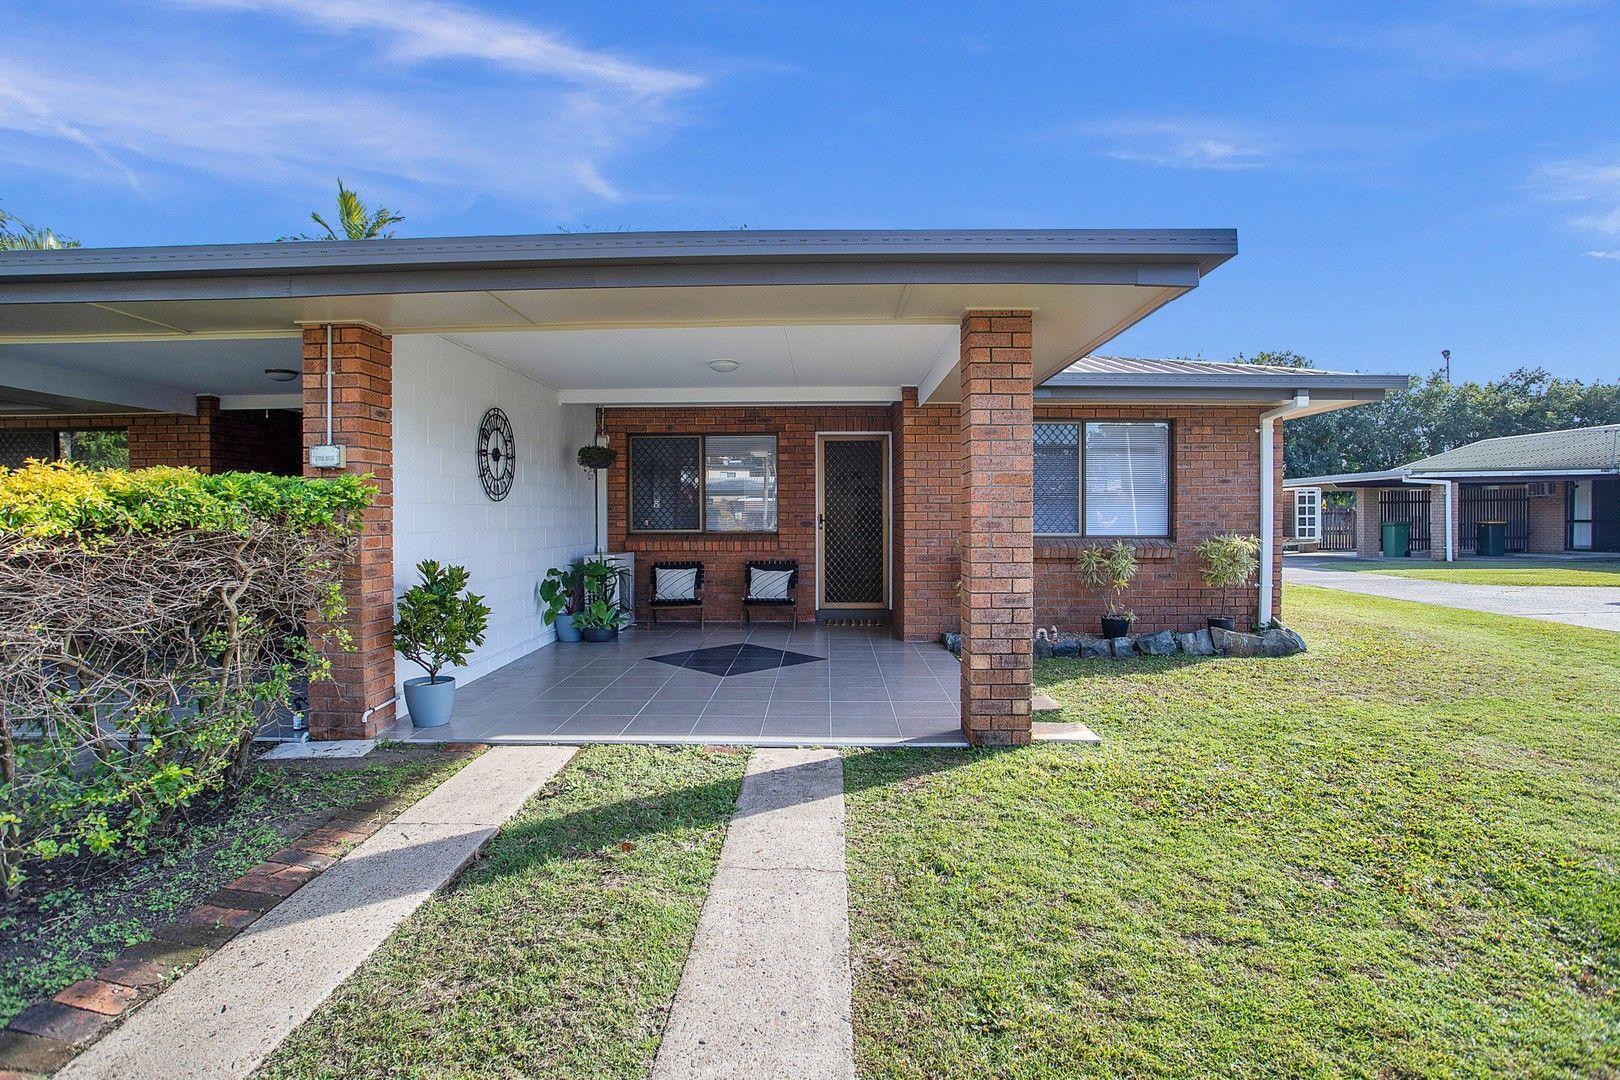 2/23 Scriha Street, North Mackay QLD 4740, Image 0